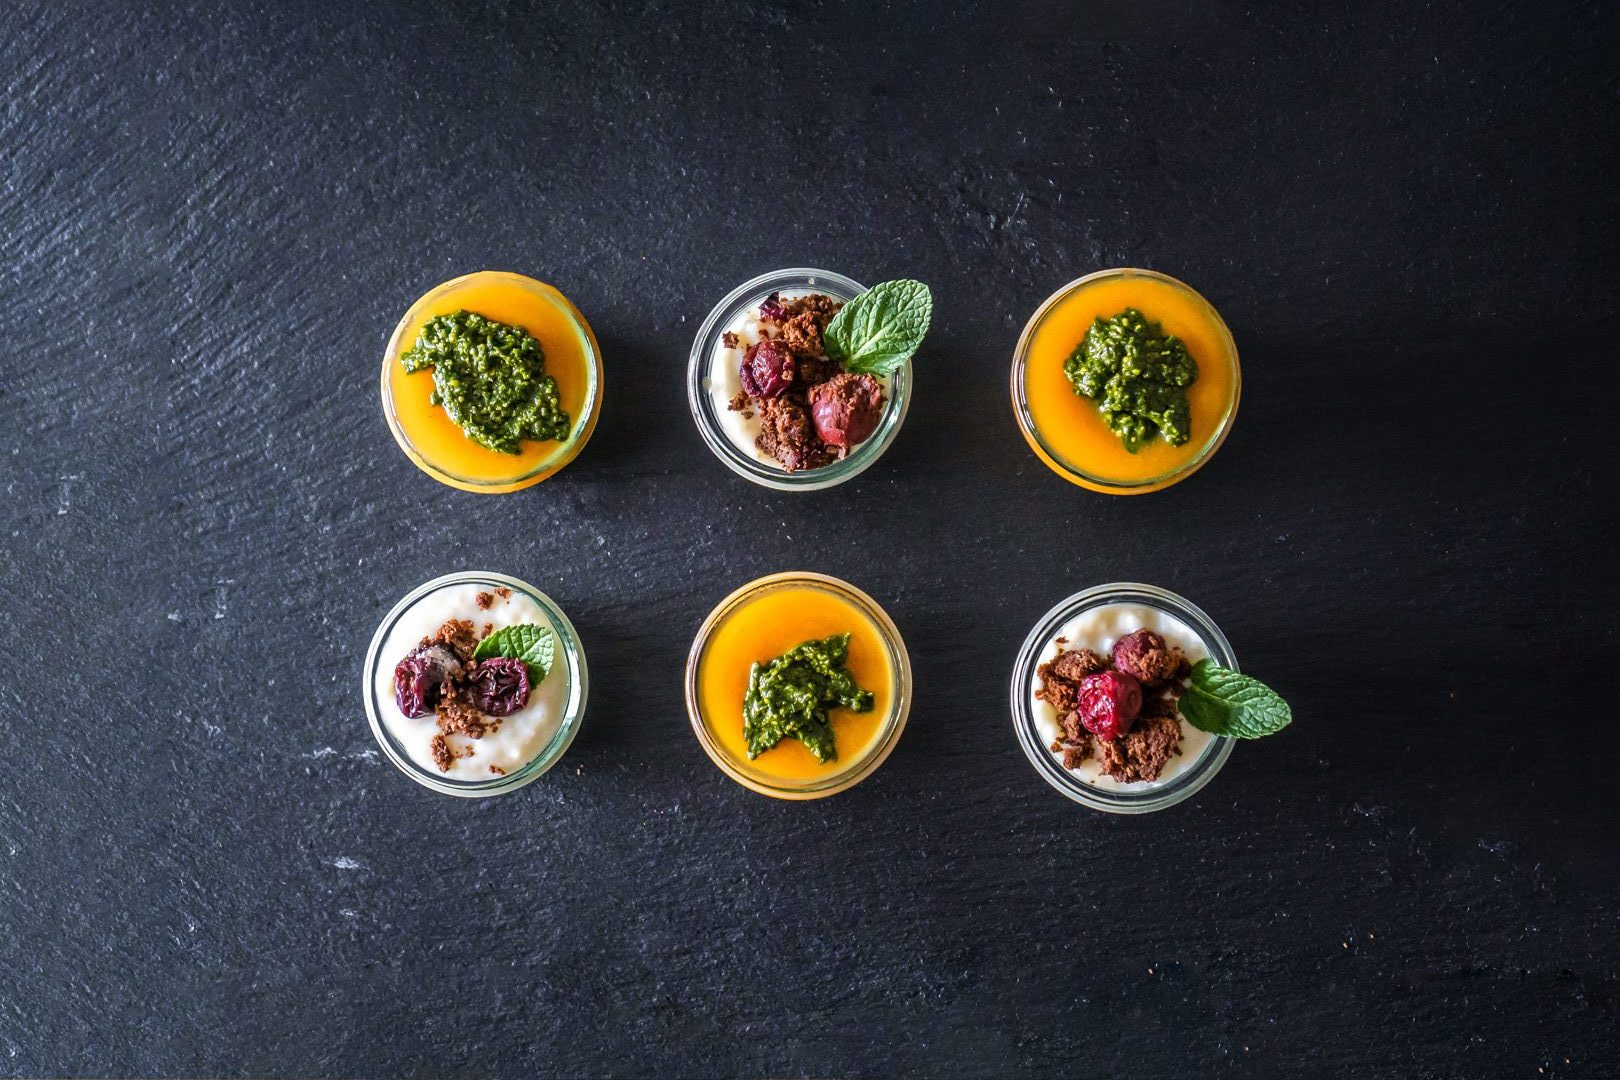 forestisland foodfotografie fotograf duesseldorf